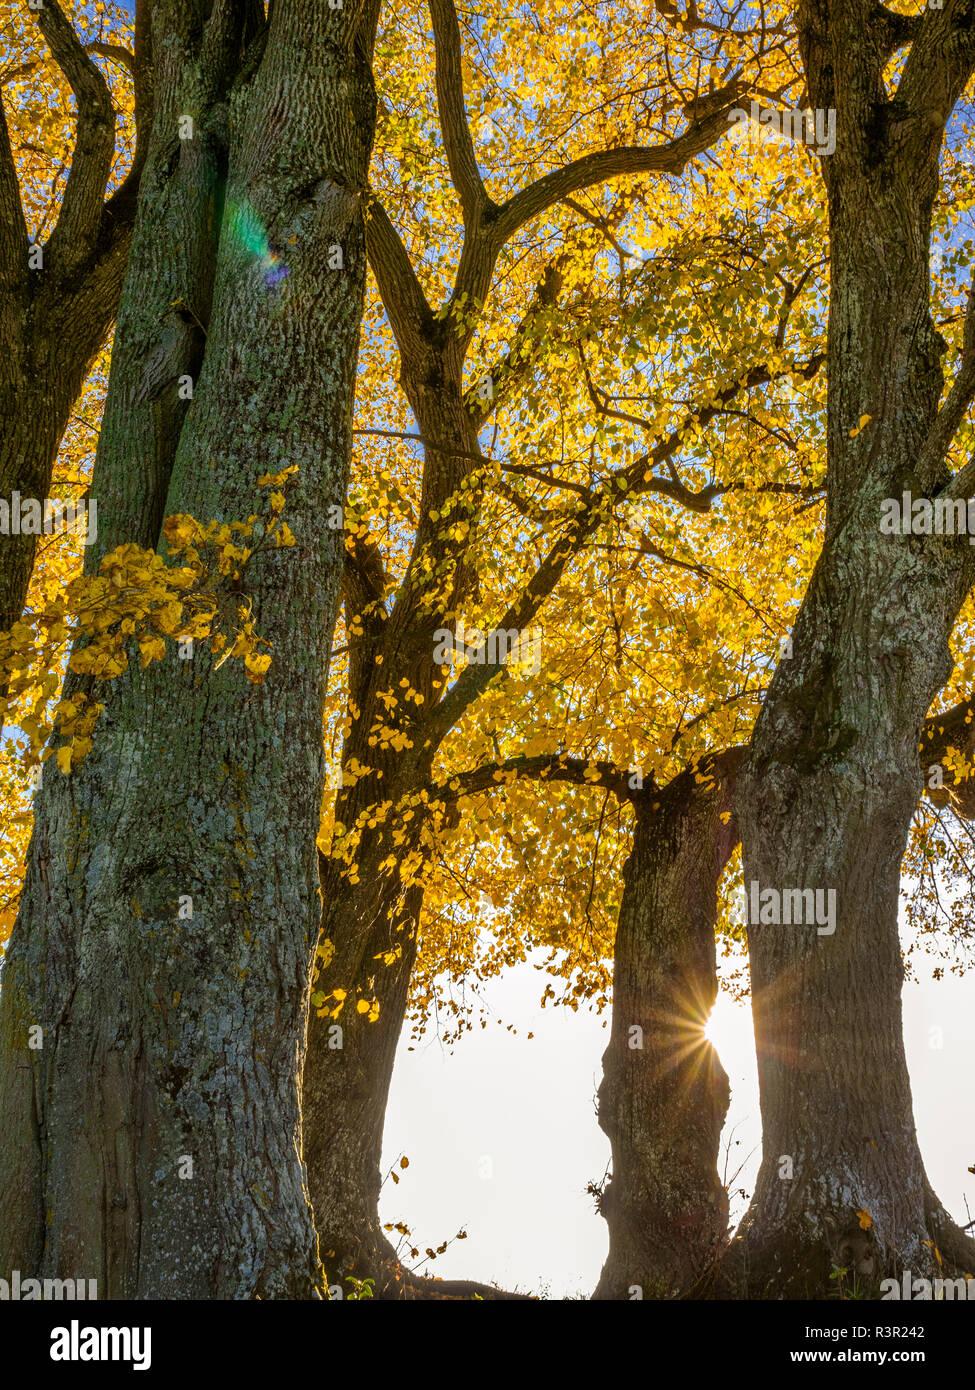 Linden tree (Tilia) with autumn colouring and solar reflex, Diessen, Upper Bavaria, Bavaria, Germany, Europe Stock Photo